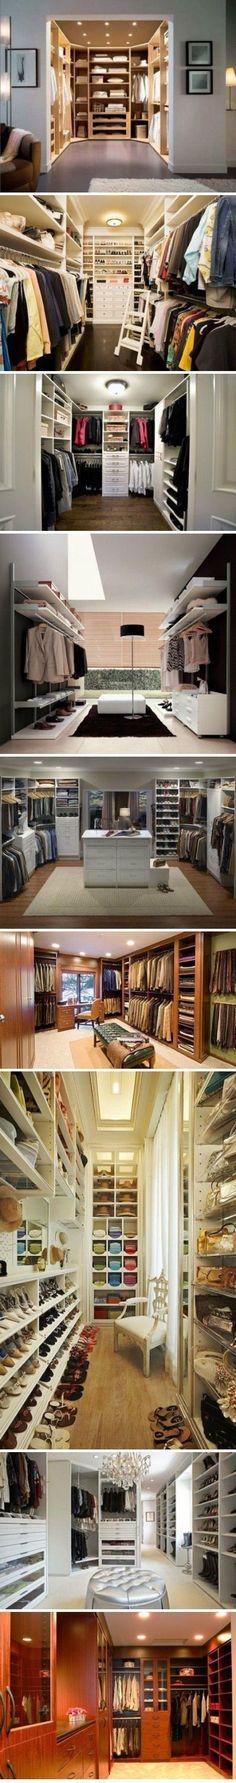 Walk-in closet design Walk In Wardrobe, Walk In Closet, Master Closet, Closet Space, Master Suite, Closet Mirror, Huge Closet, Dream Closets, Big Closets